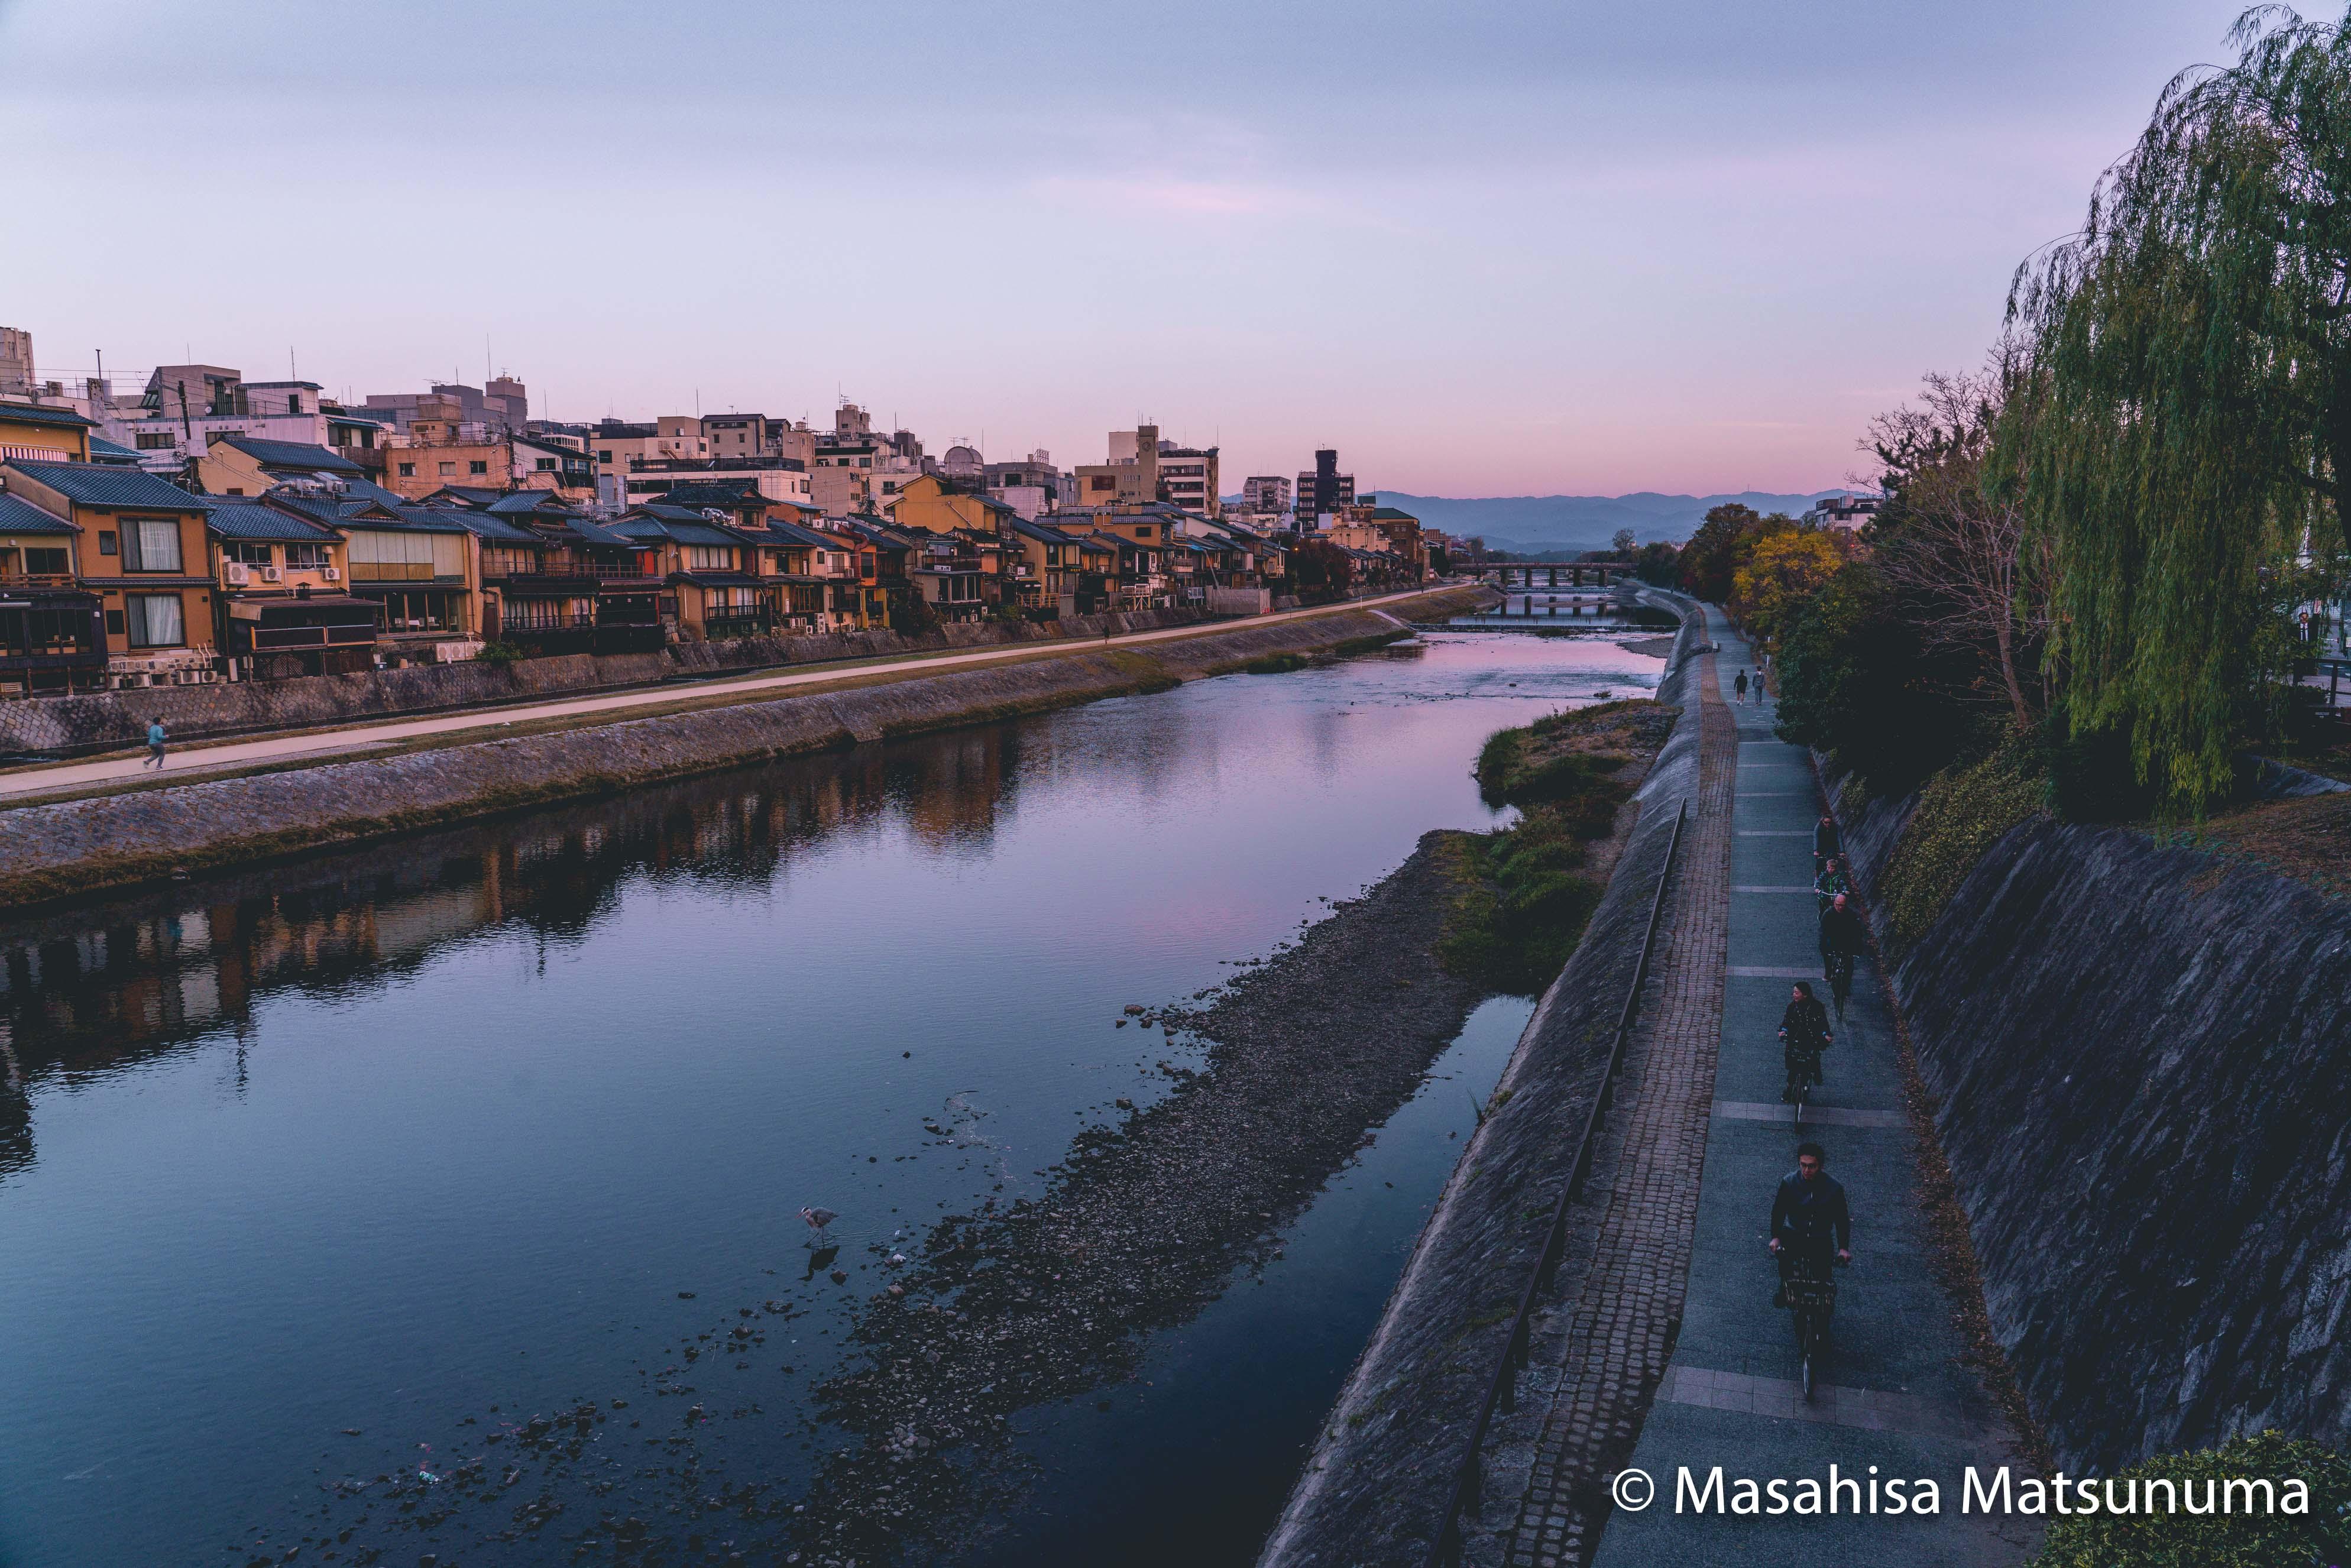 Kamogawa Kamo River 鴨川